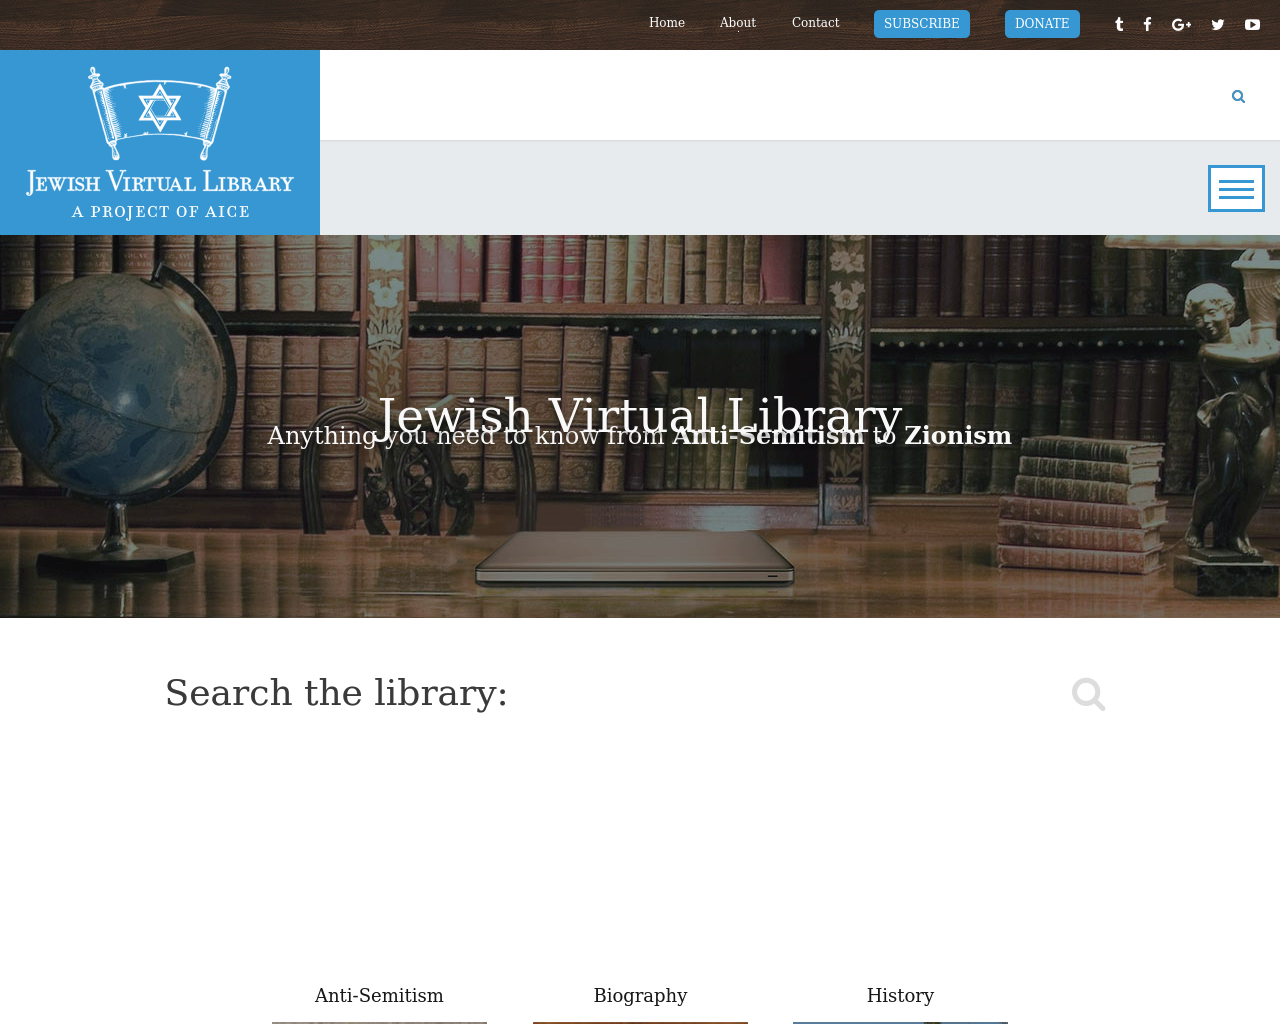 JEWISH-VIRTUAL-LIBRARY-Advertising-Reviews-Pricing